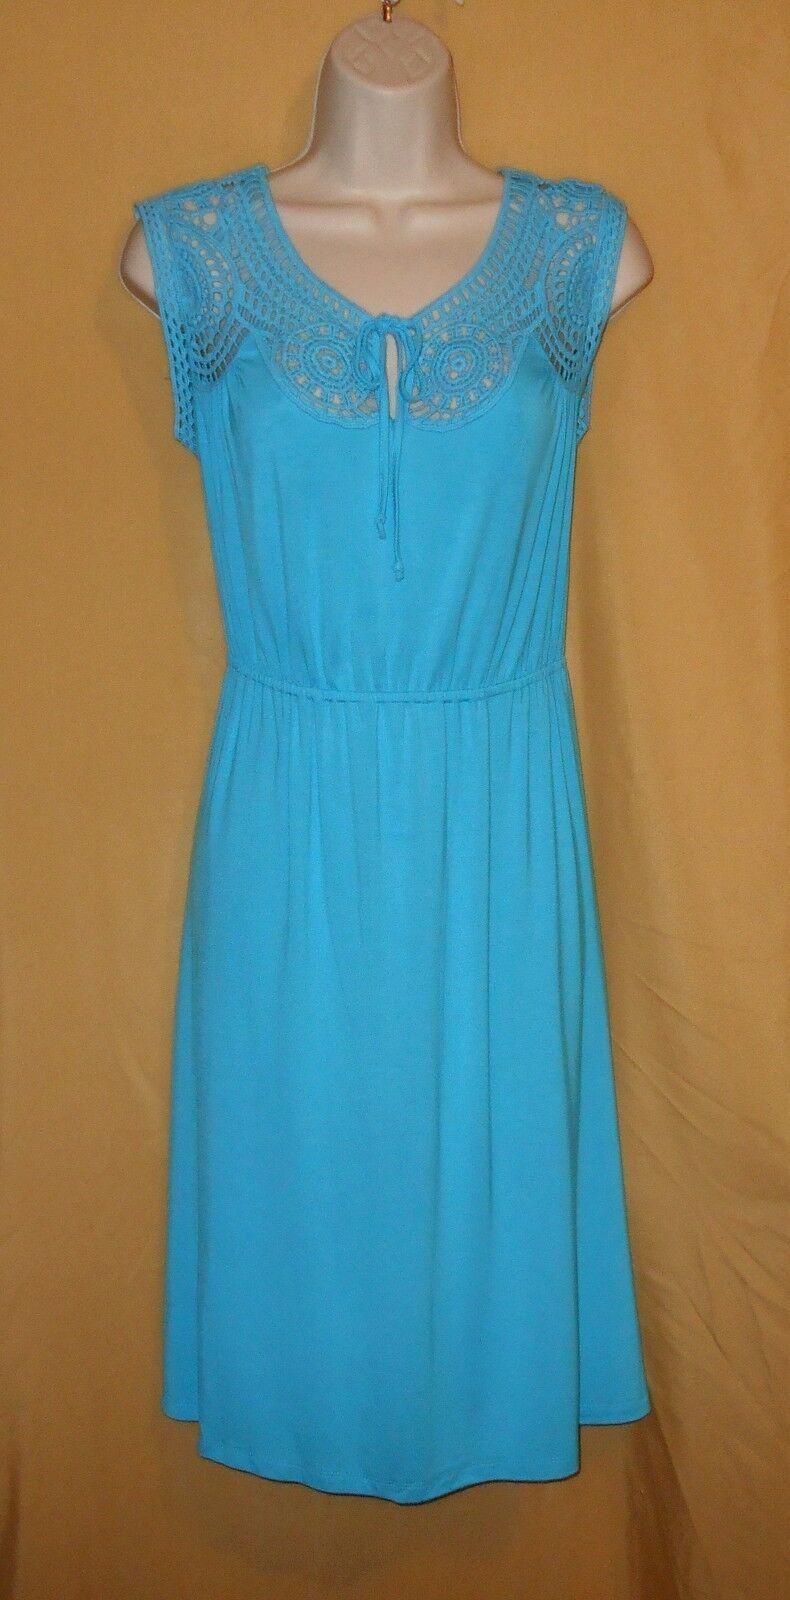 Spense women's turquoise aqua bluee crochet top sundress dress keyhole S